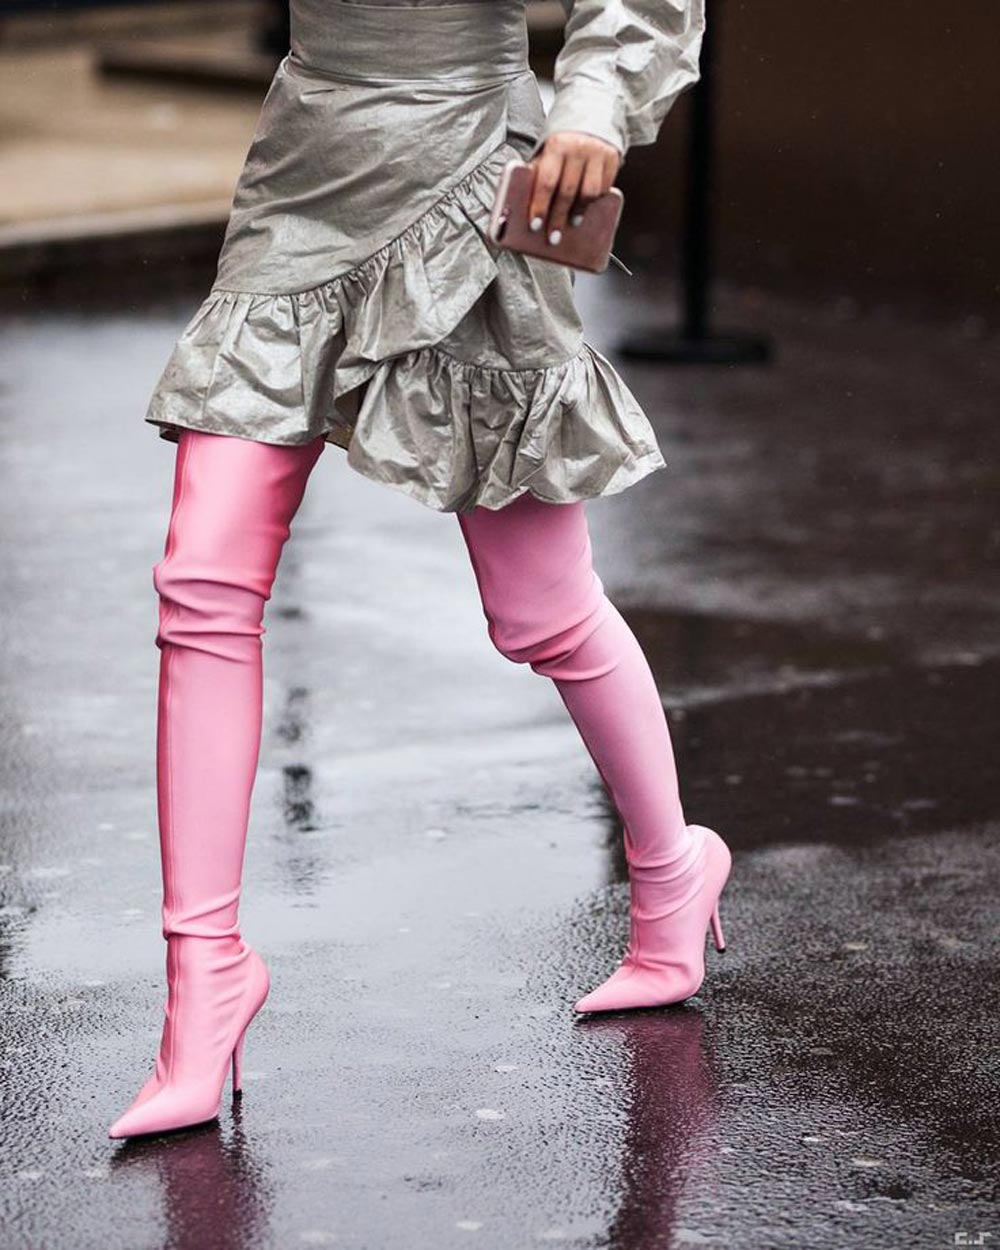 Balenciaga 'Knife' Sock Boots Pink Thigh-High